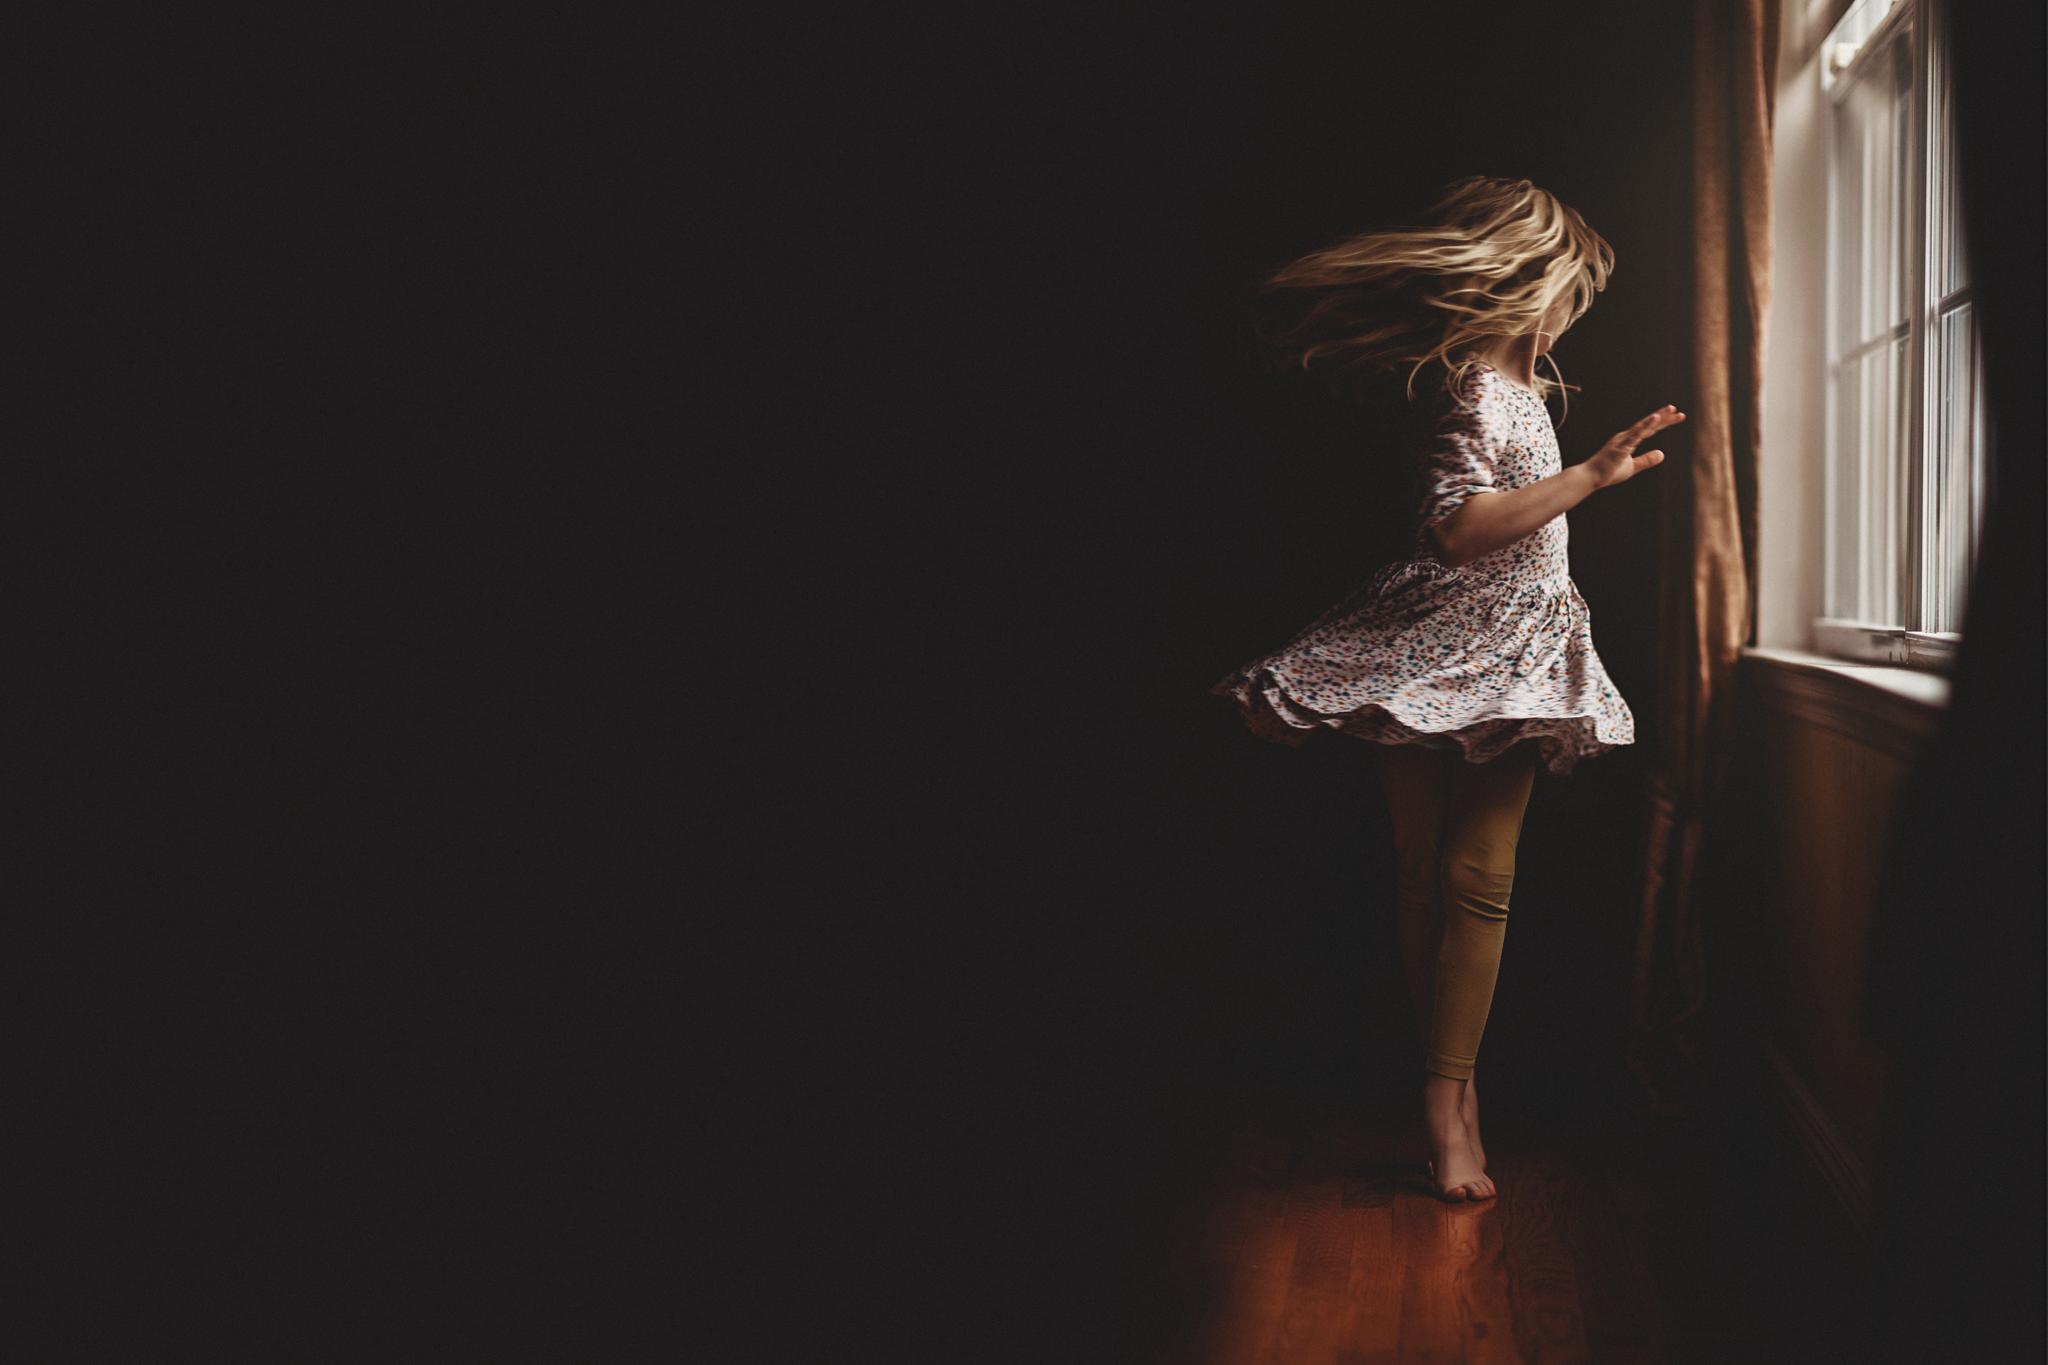 Hello-olivia-photography-long-island-photographer-children-lifestyle-dancing-window